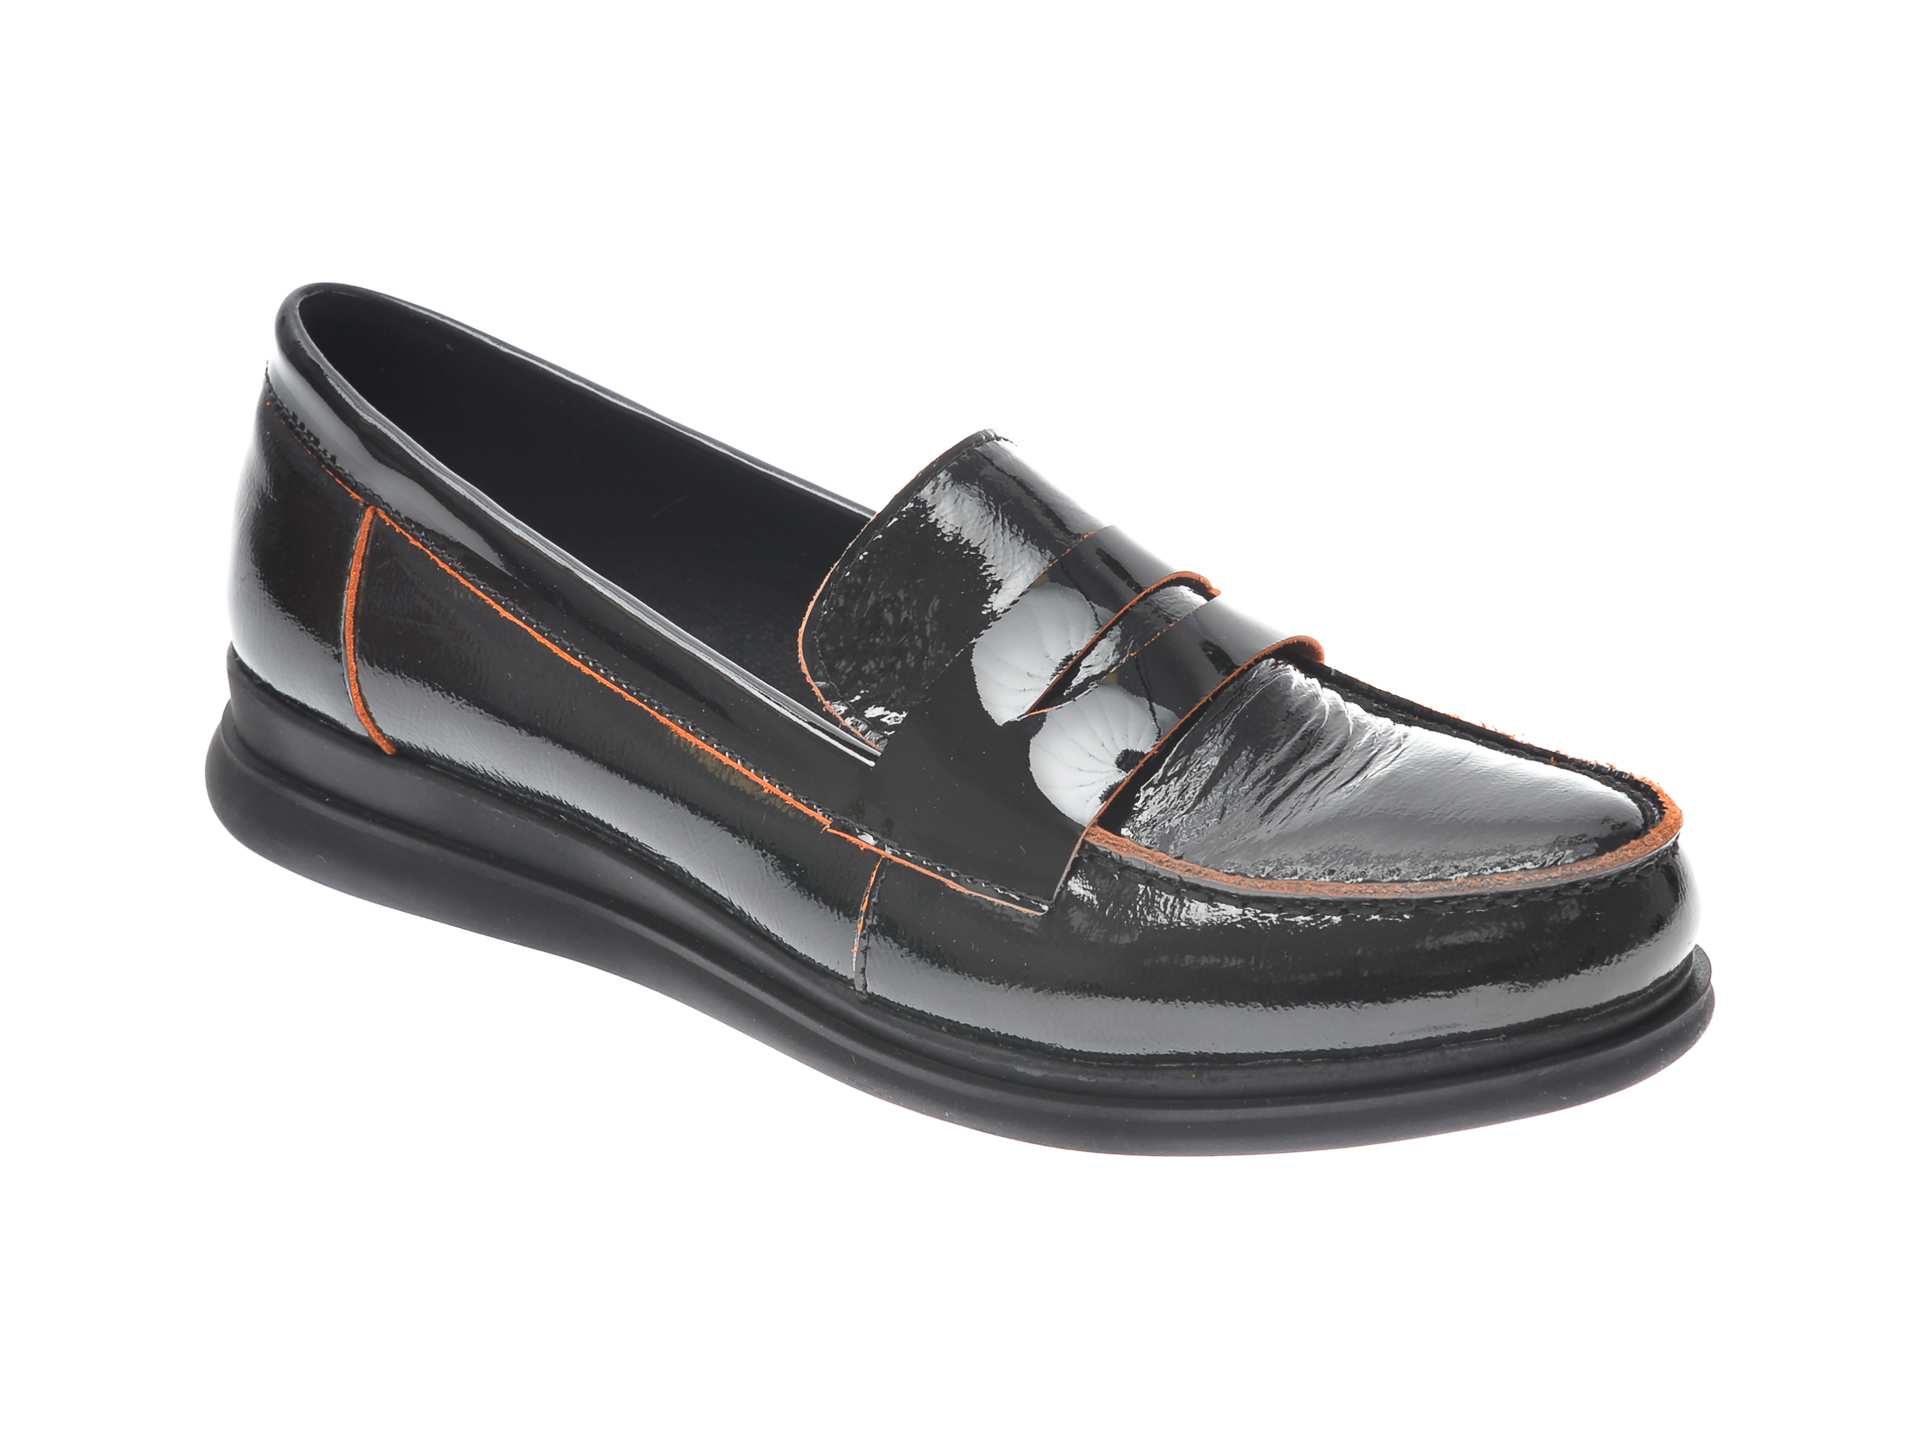 Pantofi Flavia Passini Negri, 1307202, Din Piele Naturala Lacuita